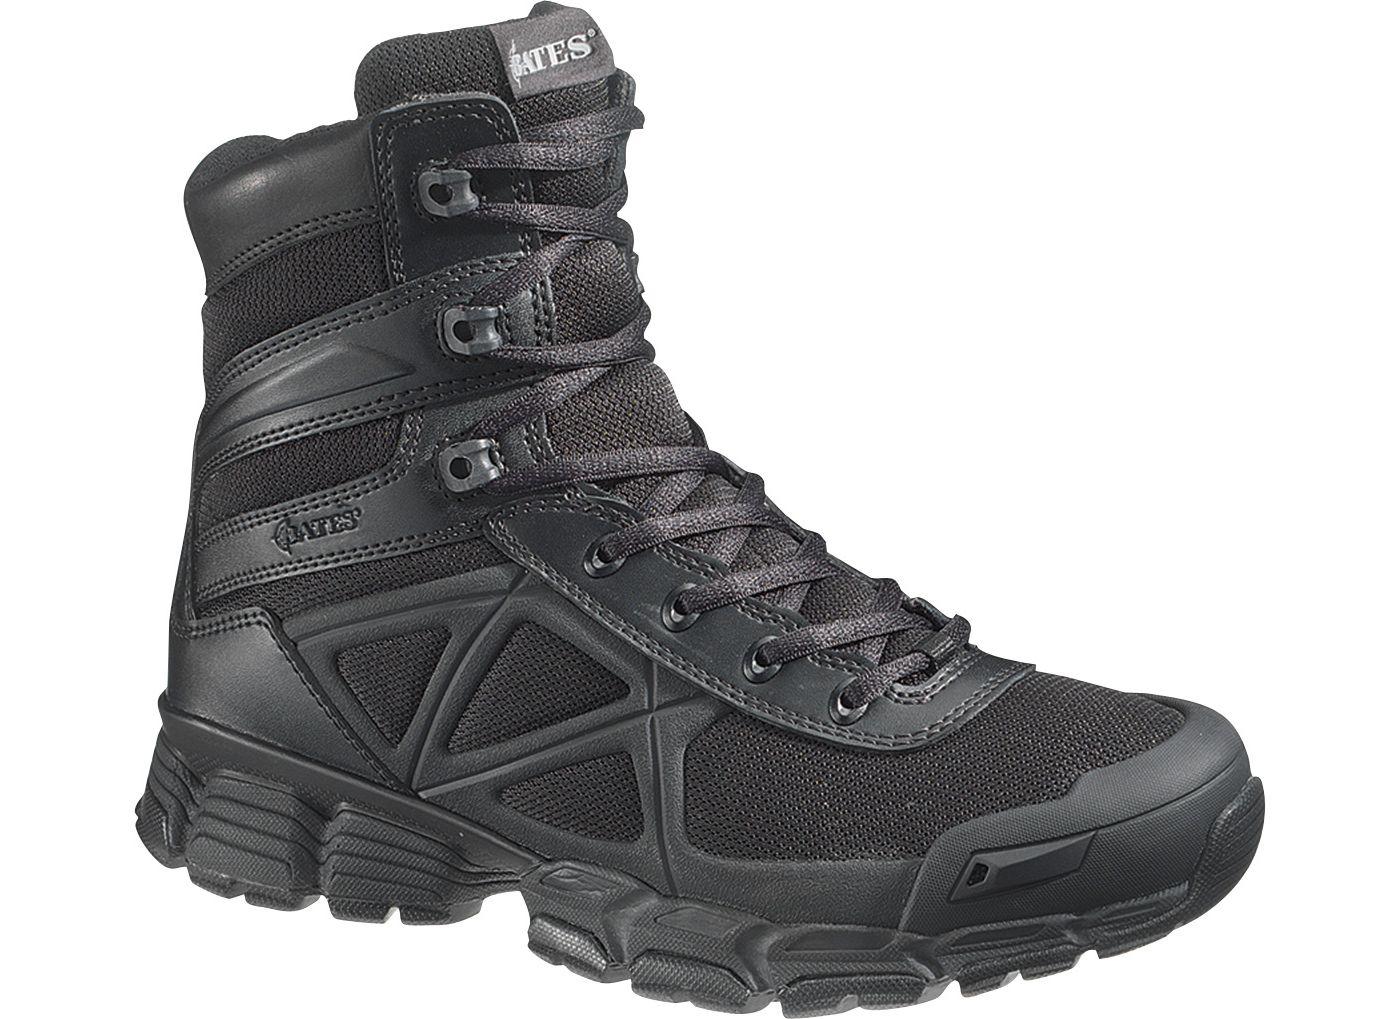 Bates Men's Velocitor Work Boots